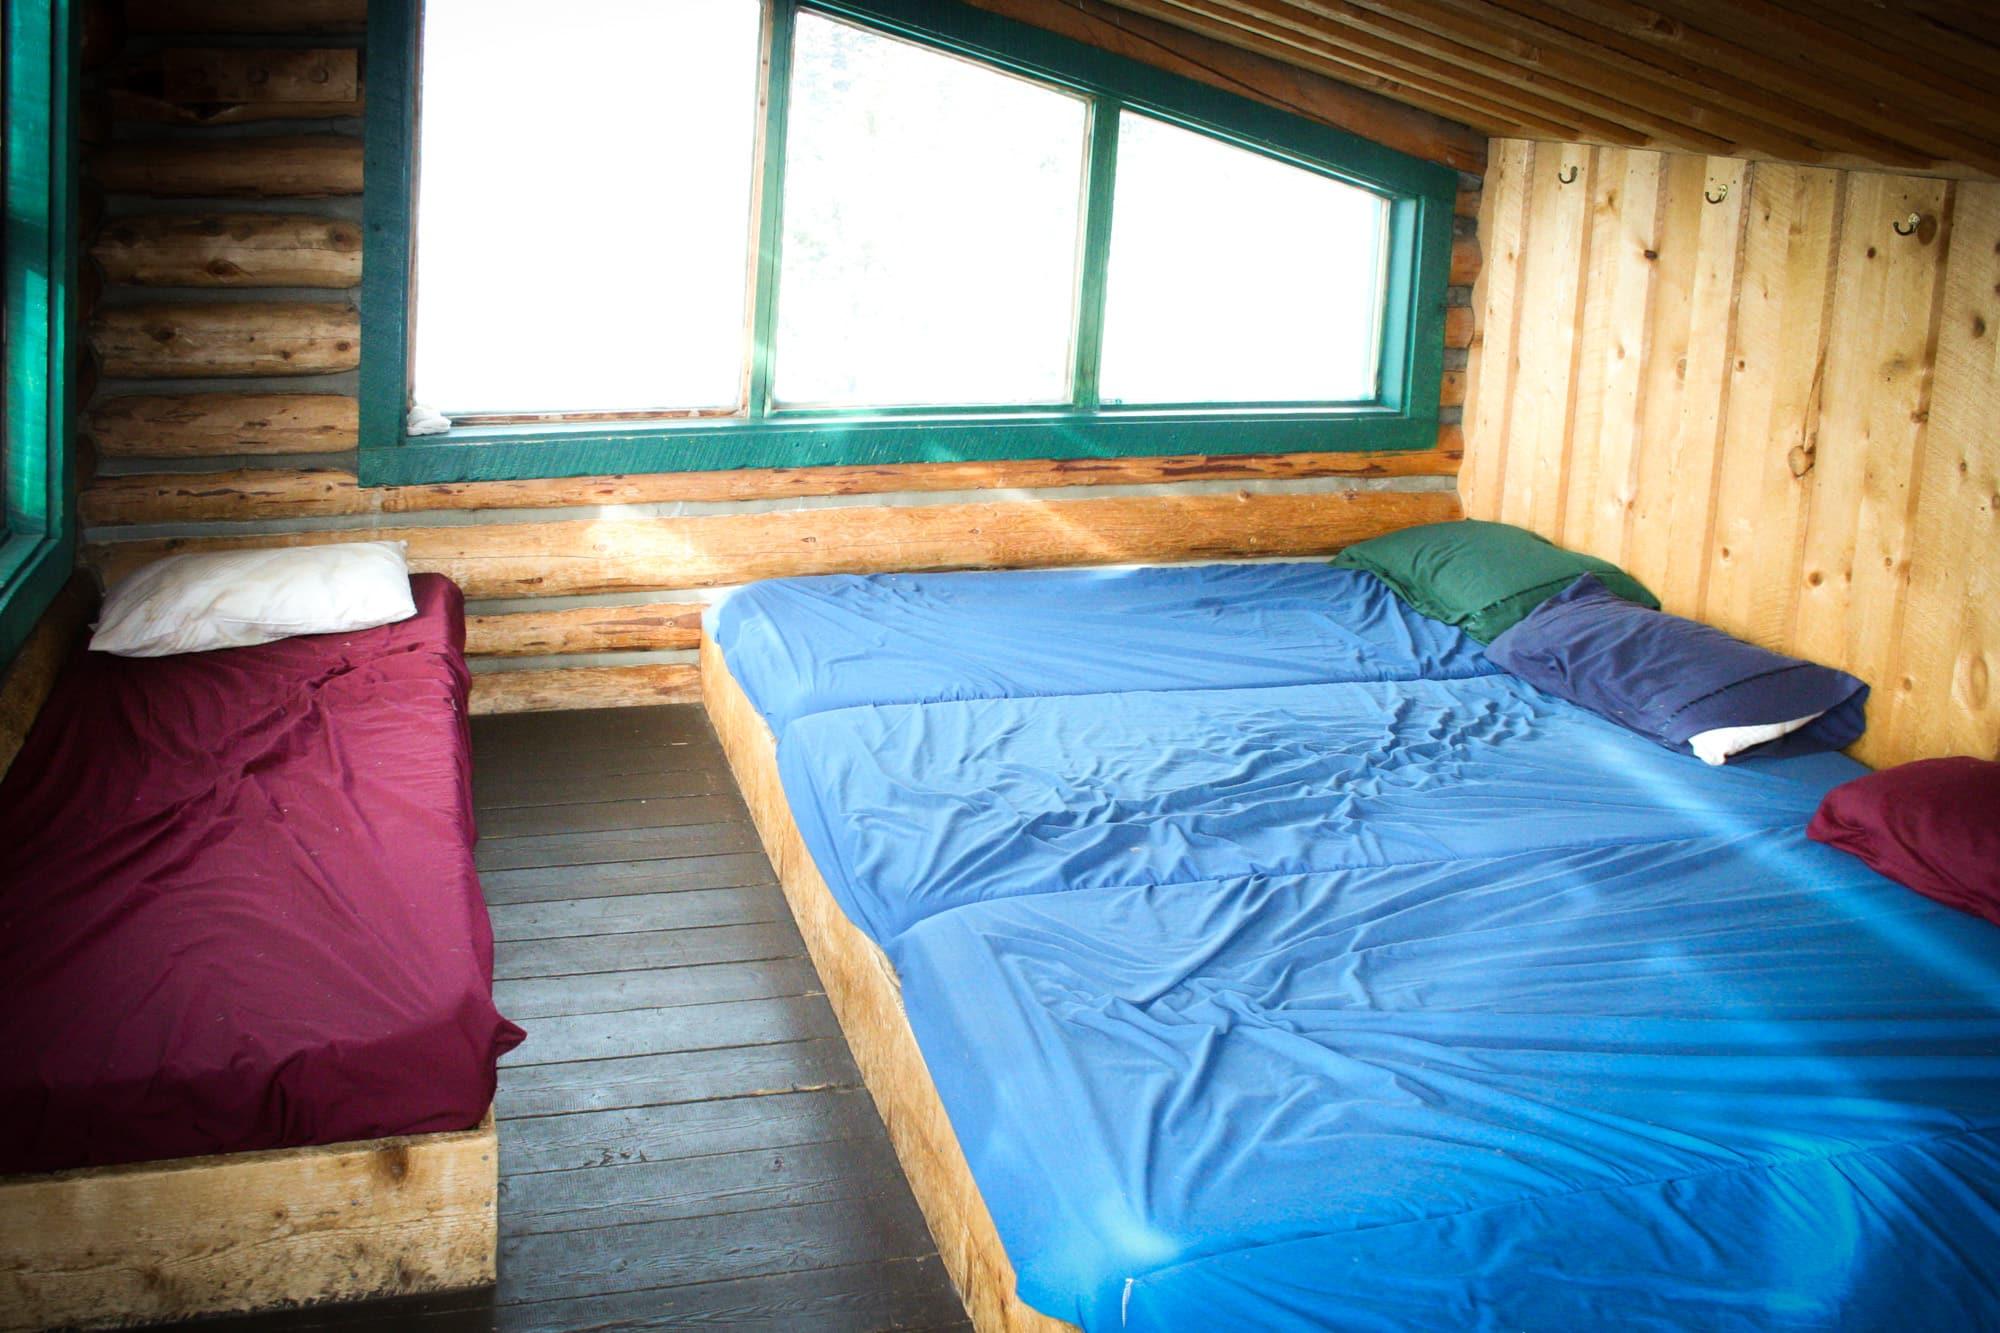 Reasons to take a backcountry hut trip - #4: No tent, no pad, no problem